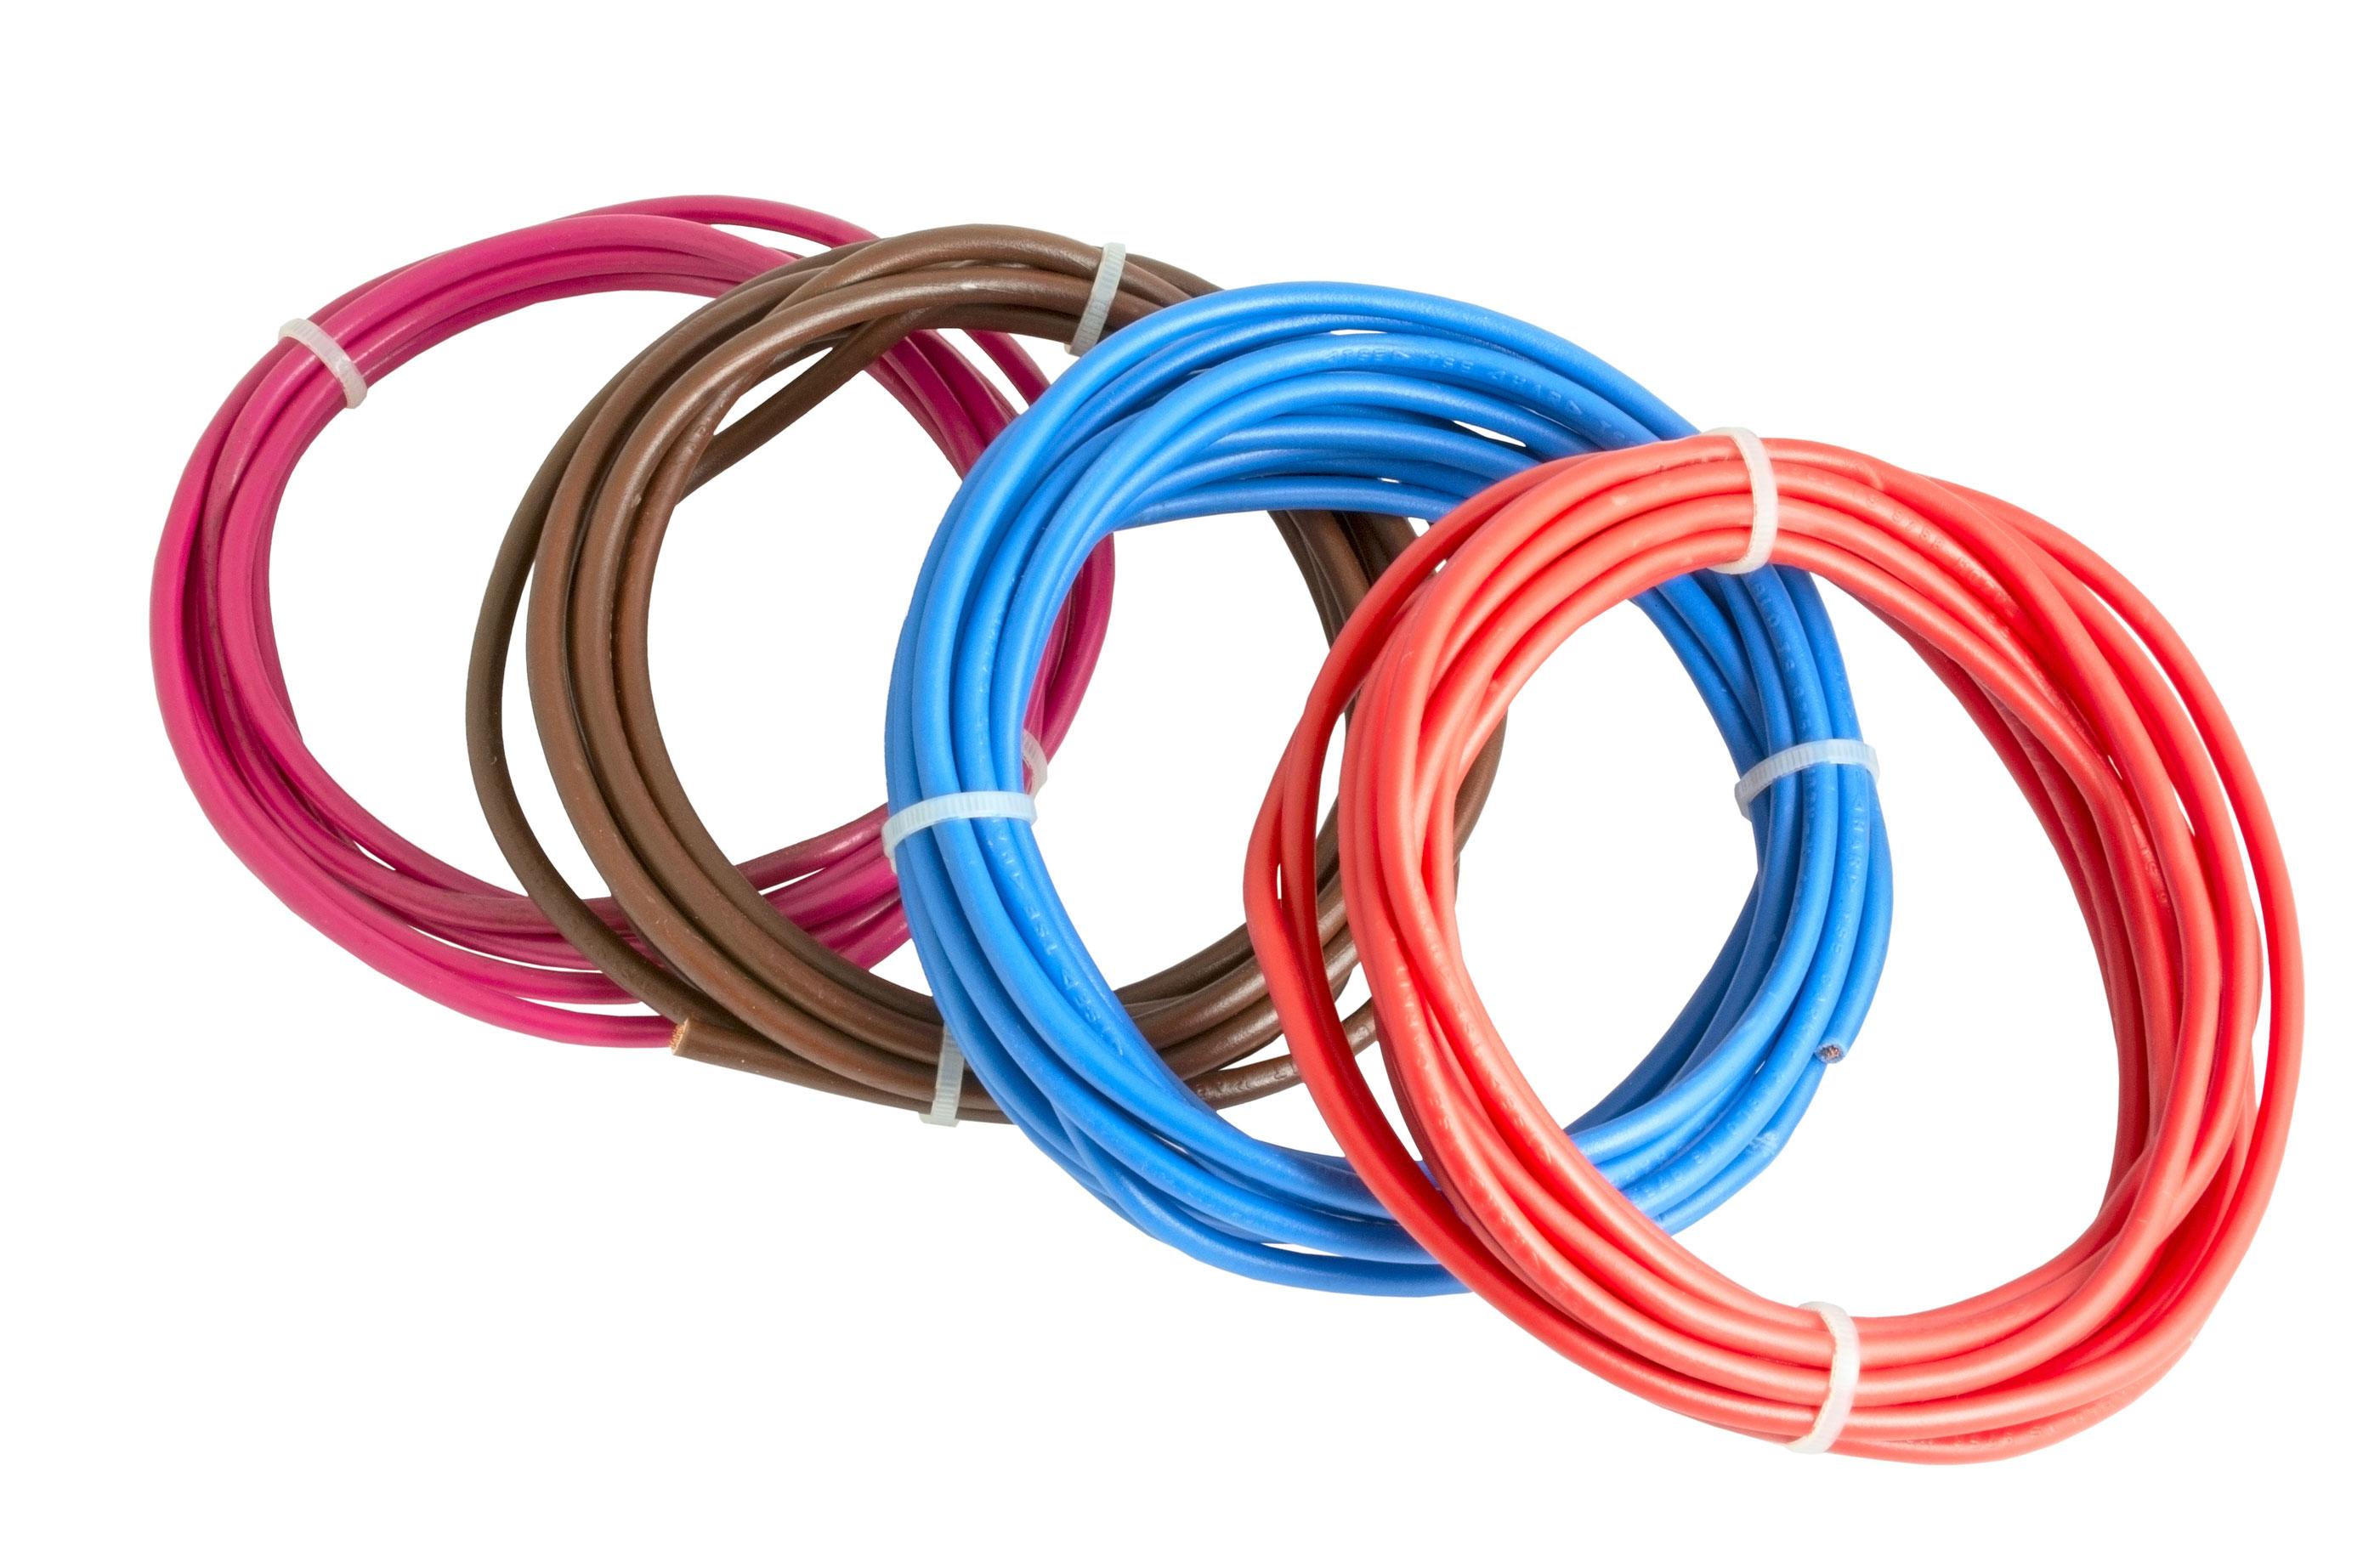 Cable assembly – META E2 F